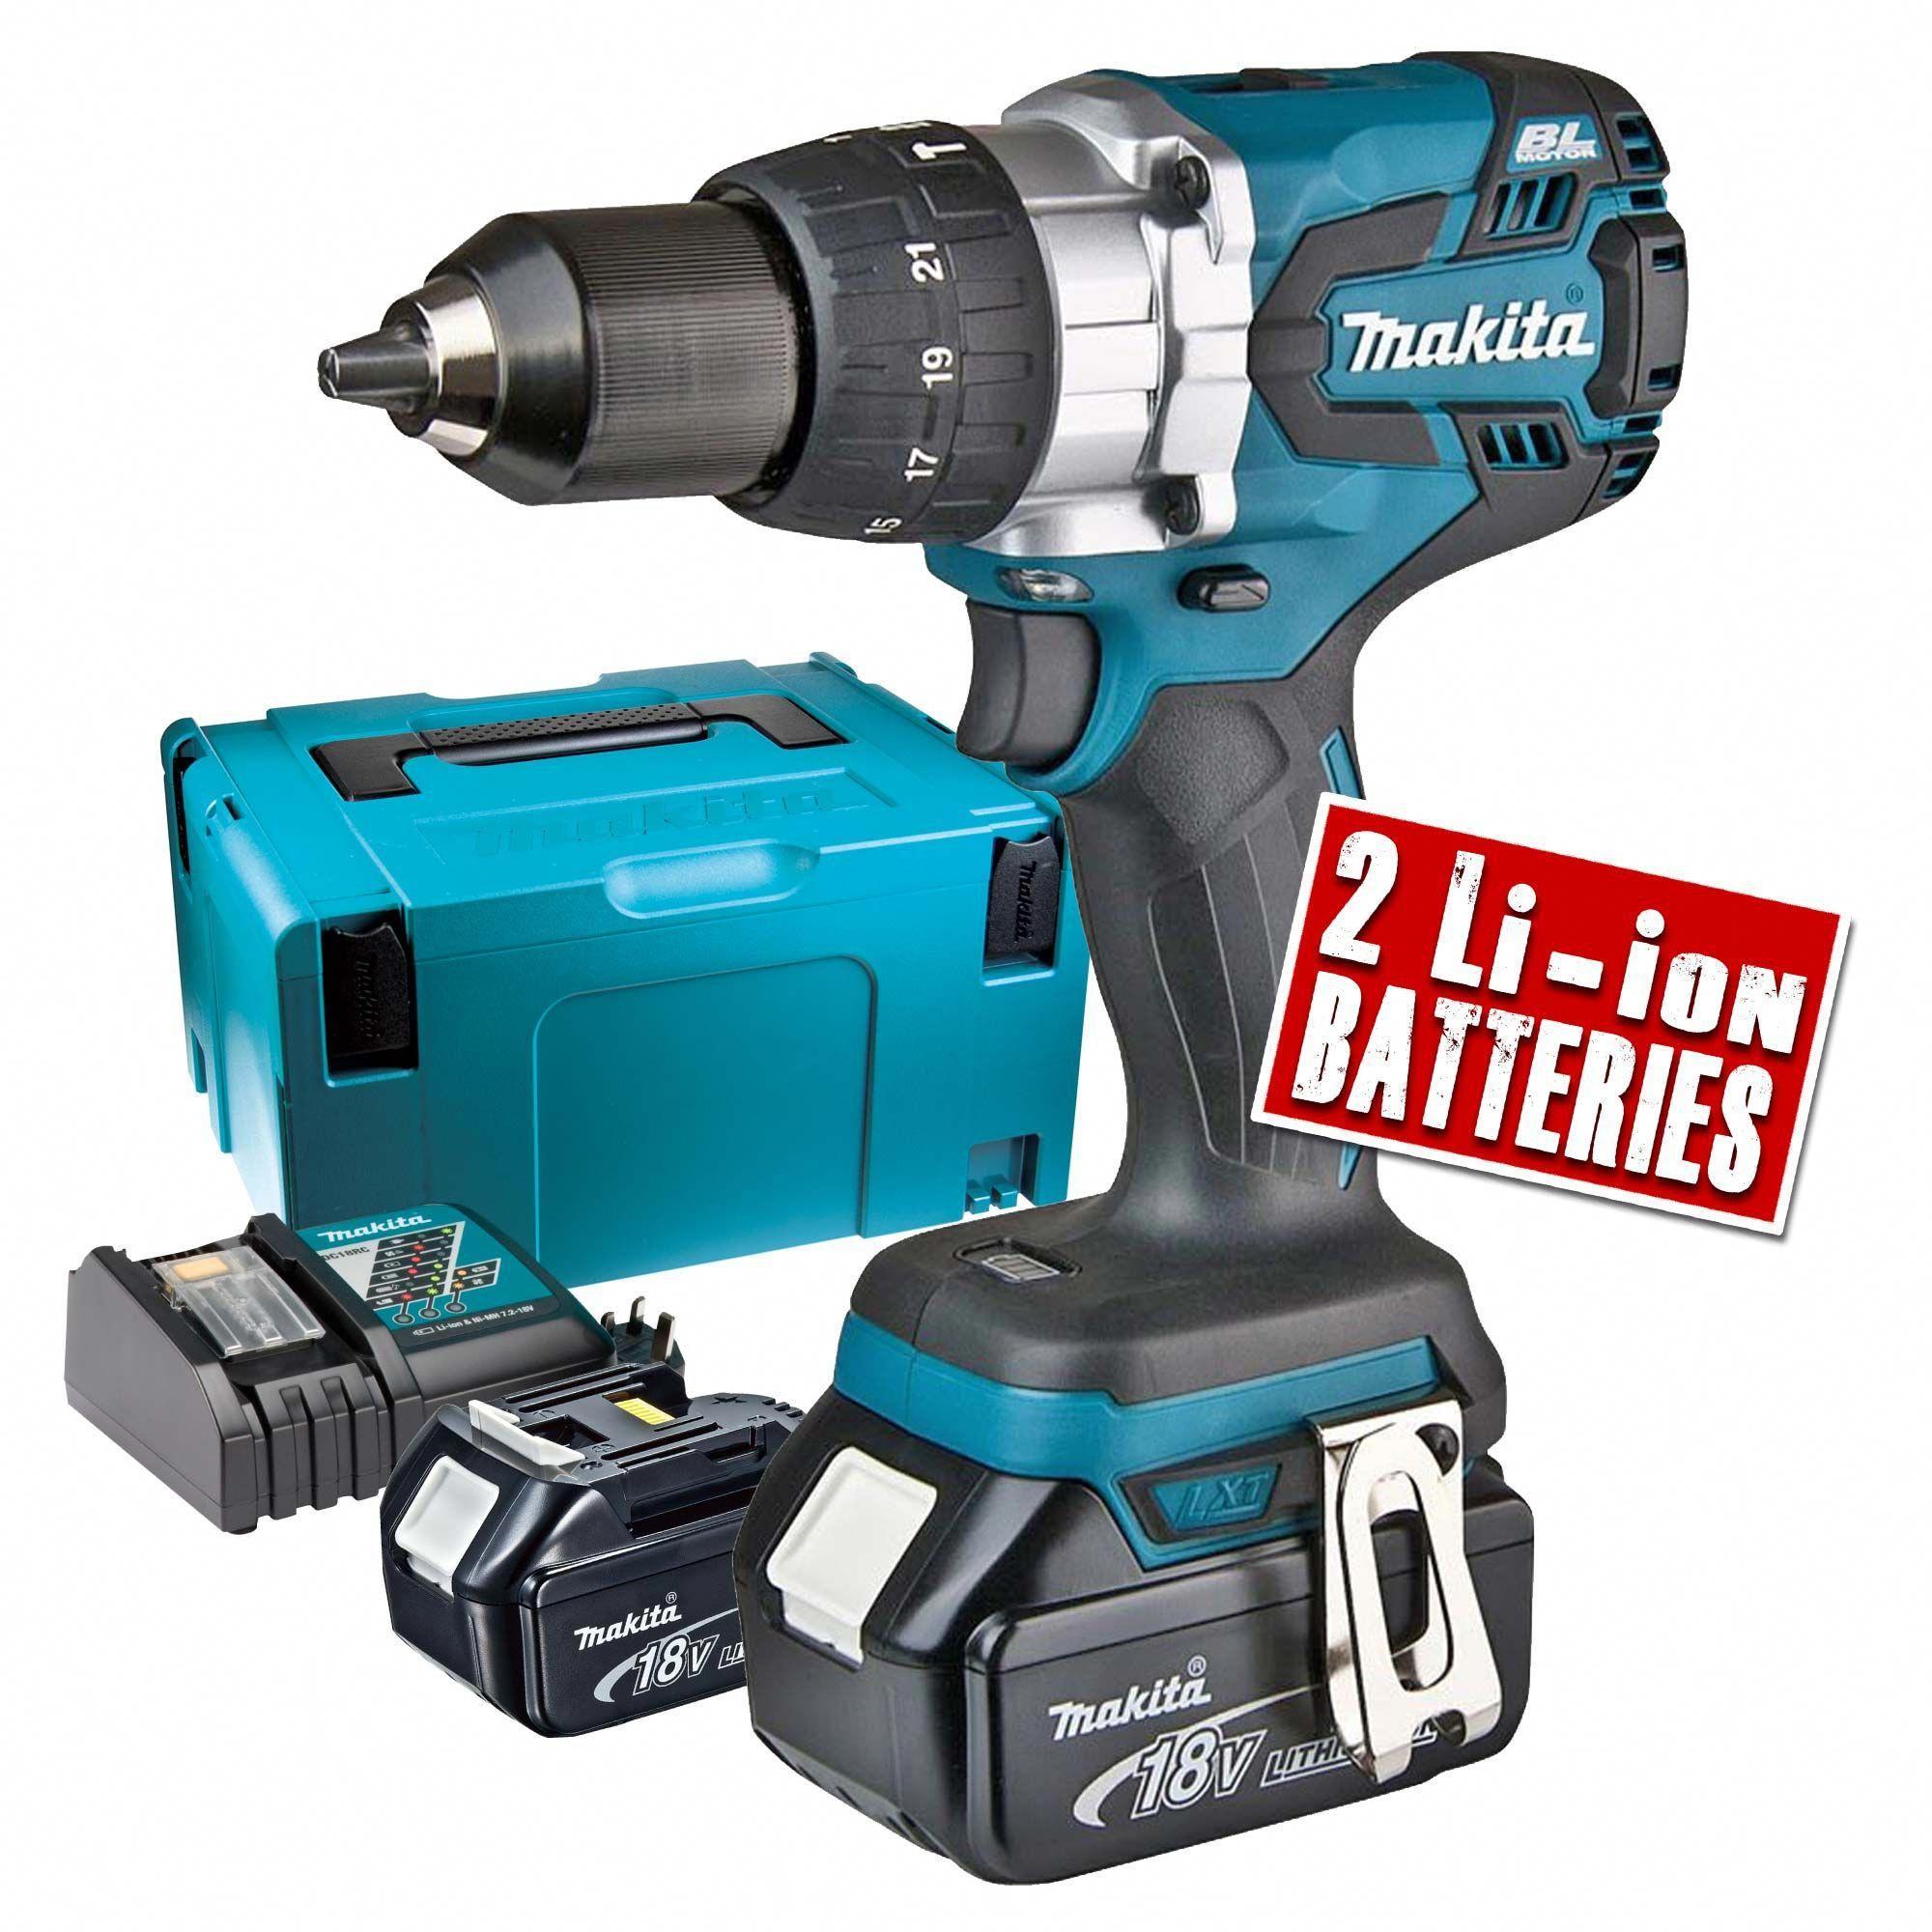 Makita Dhp481rtj Makita 18v Li Ion Brushless Hammer Drill Driver Drilldrivercombo Drill Hammer Drill Cordless Drill